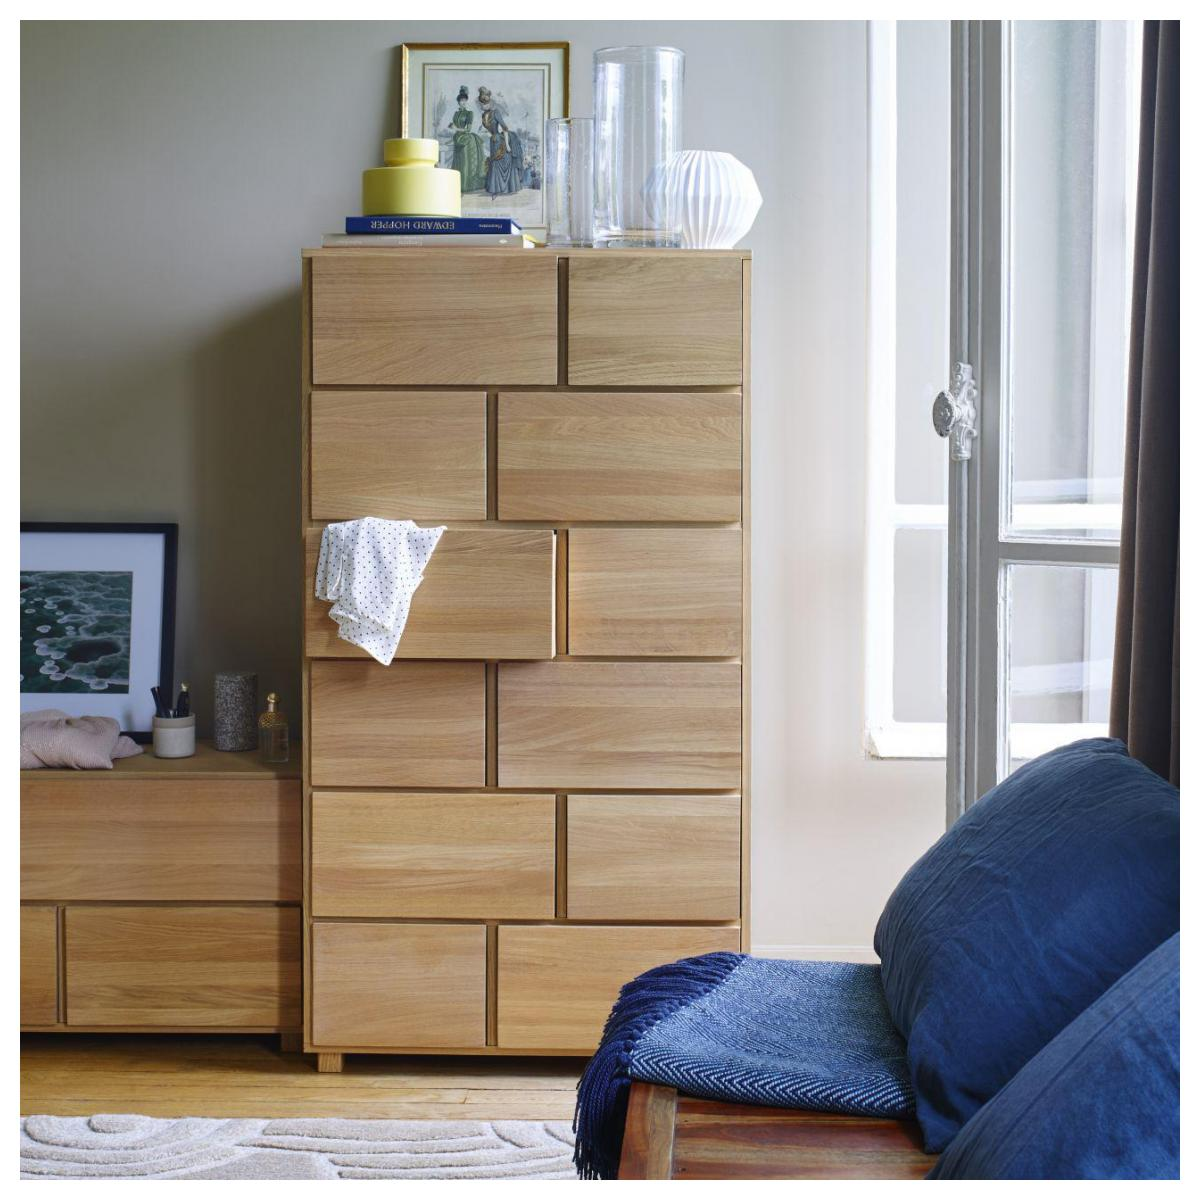 chiffonnier bois chêne massif Bethan Gray meuble chambre design - blog déco - clem around the corner